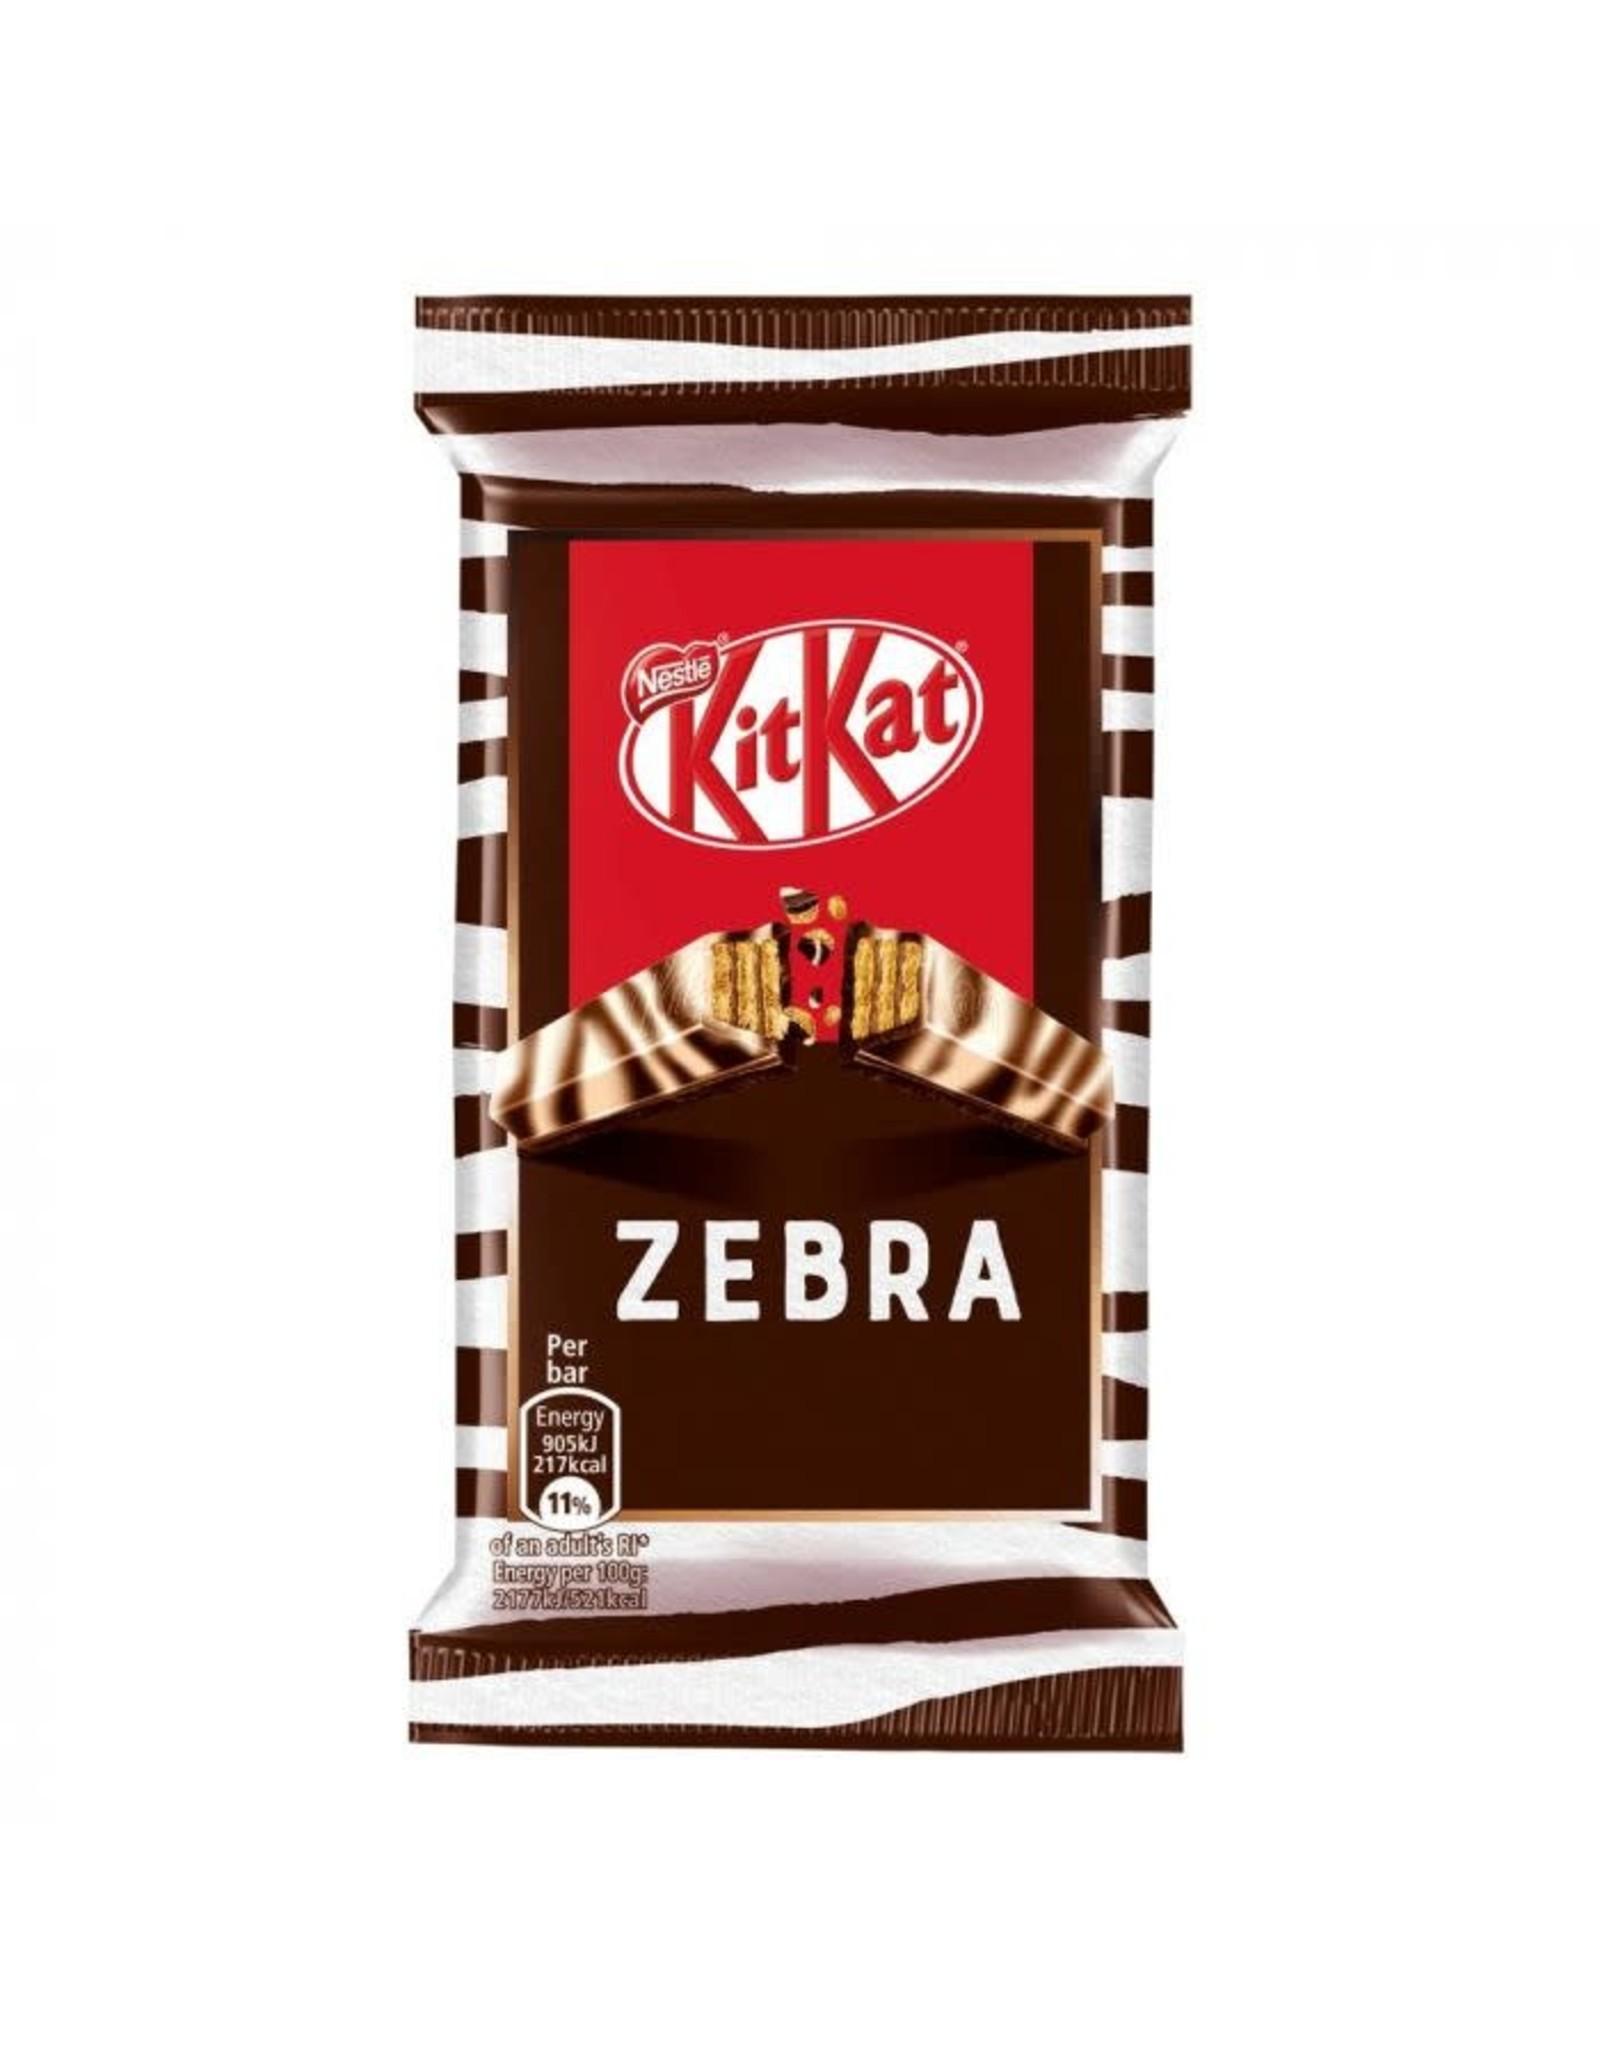 KitKat Zebra - 41g